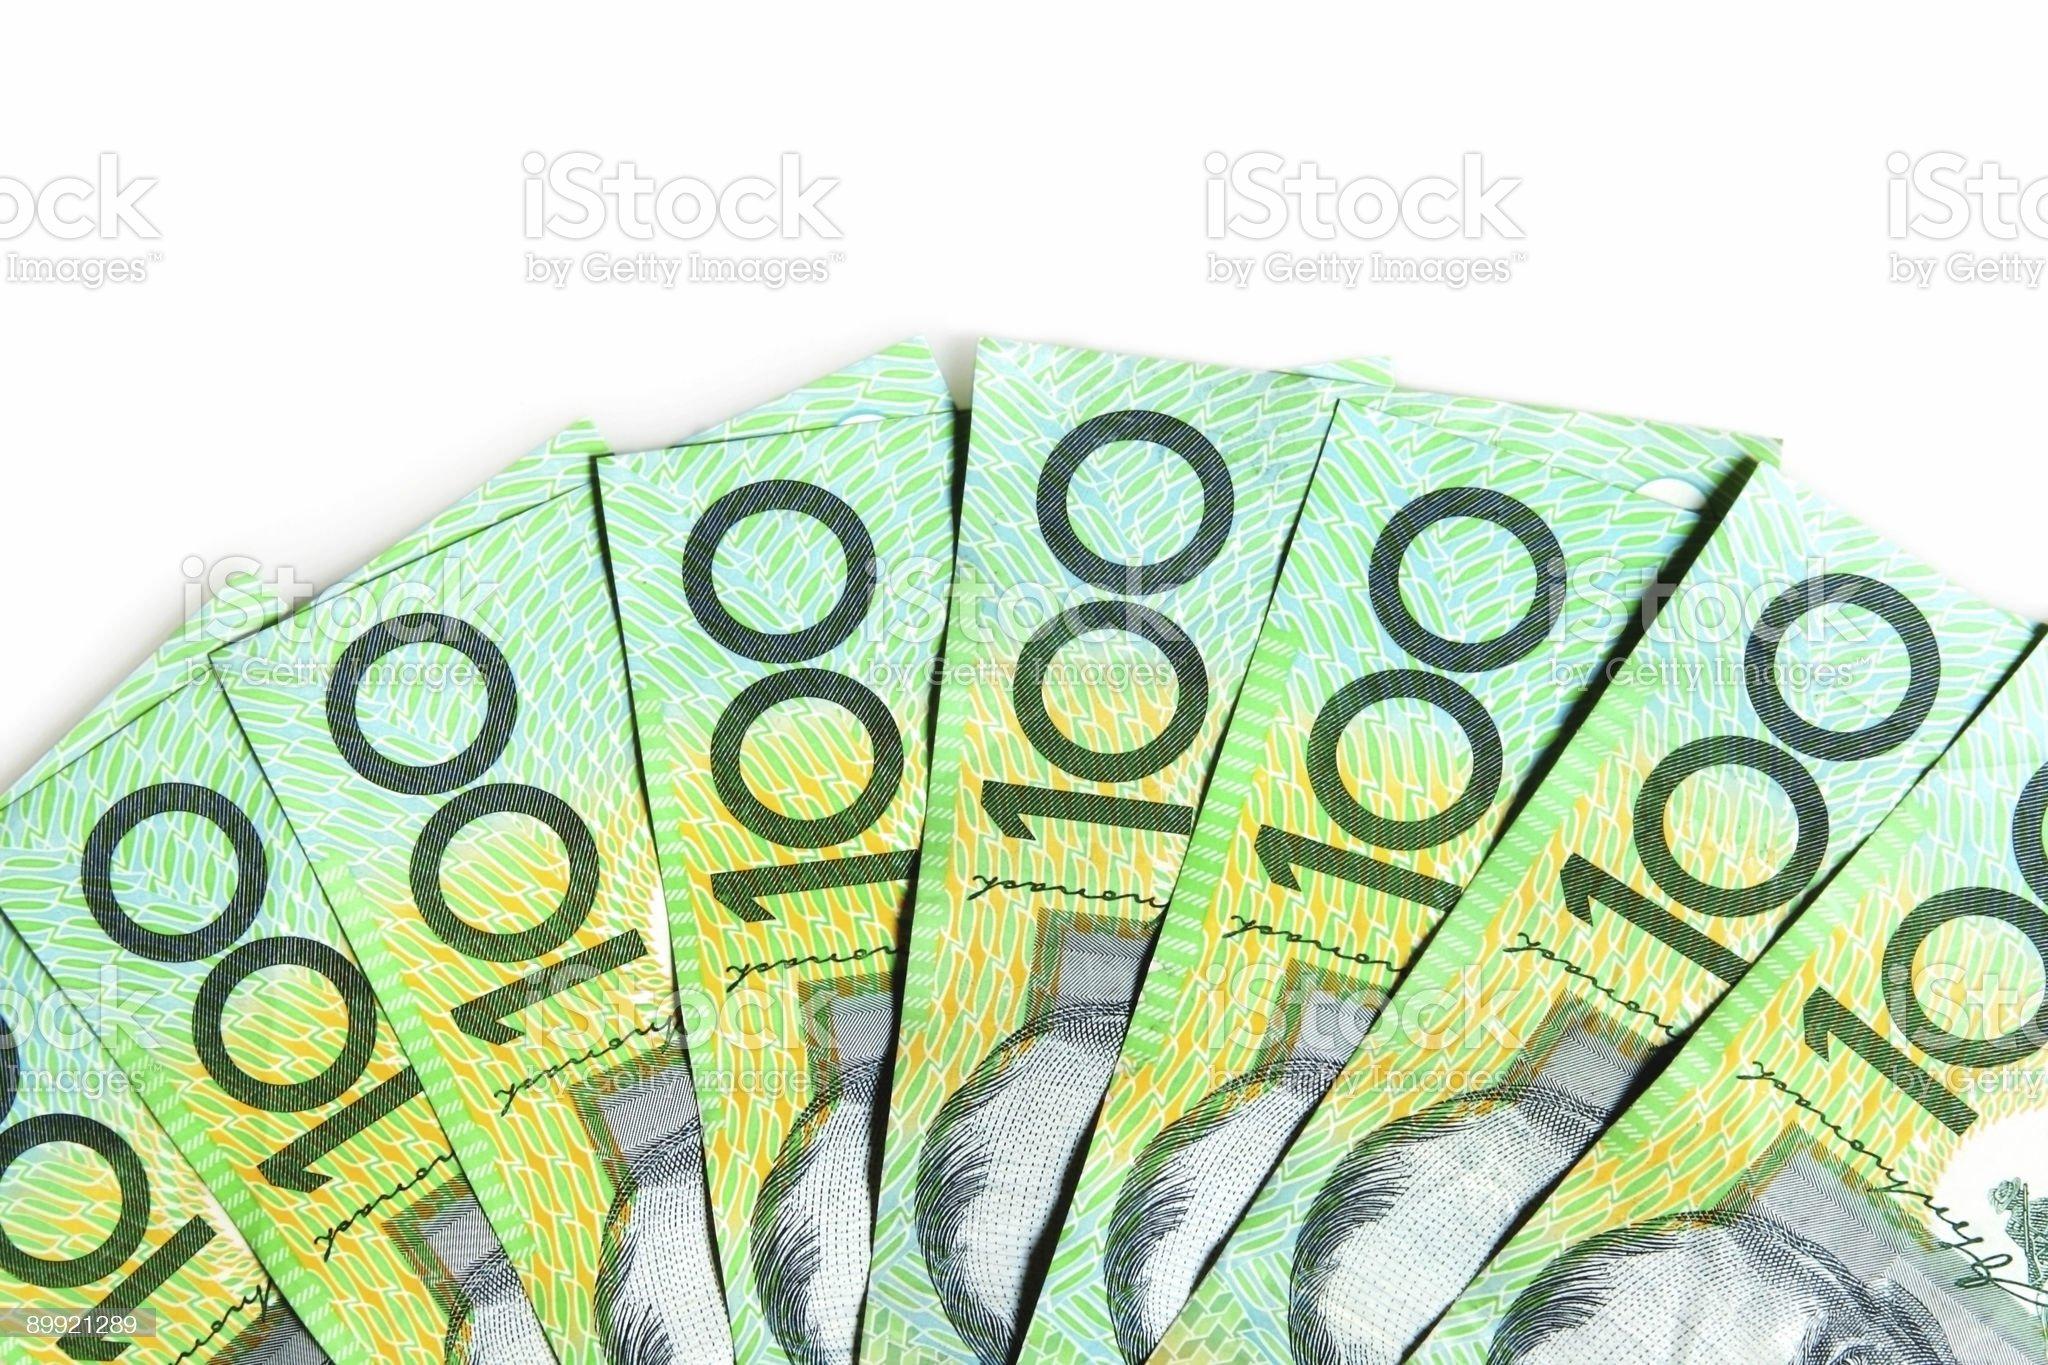 Australian $100 Bills royalty-free stock photo